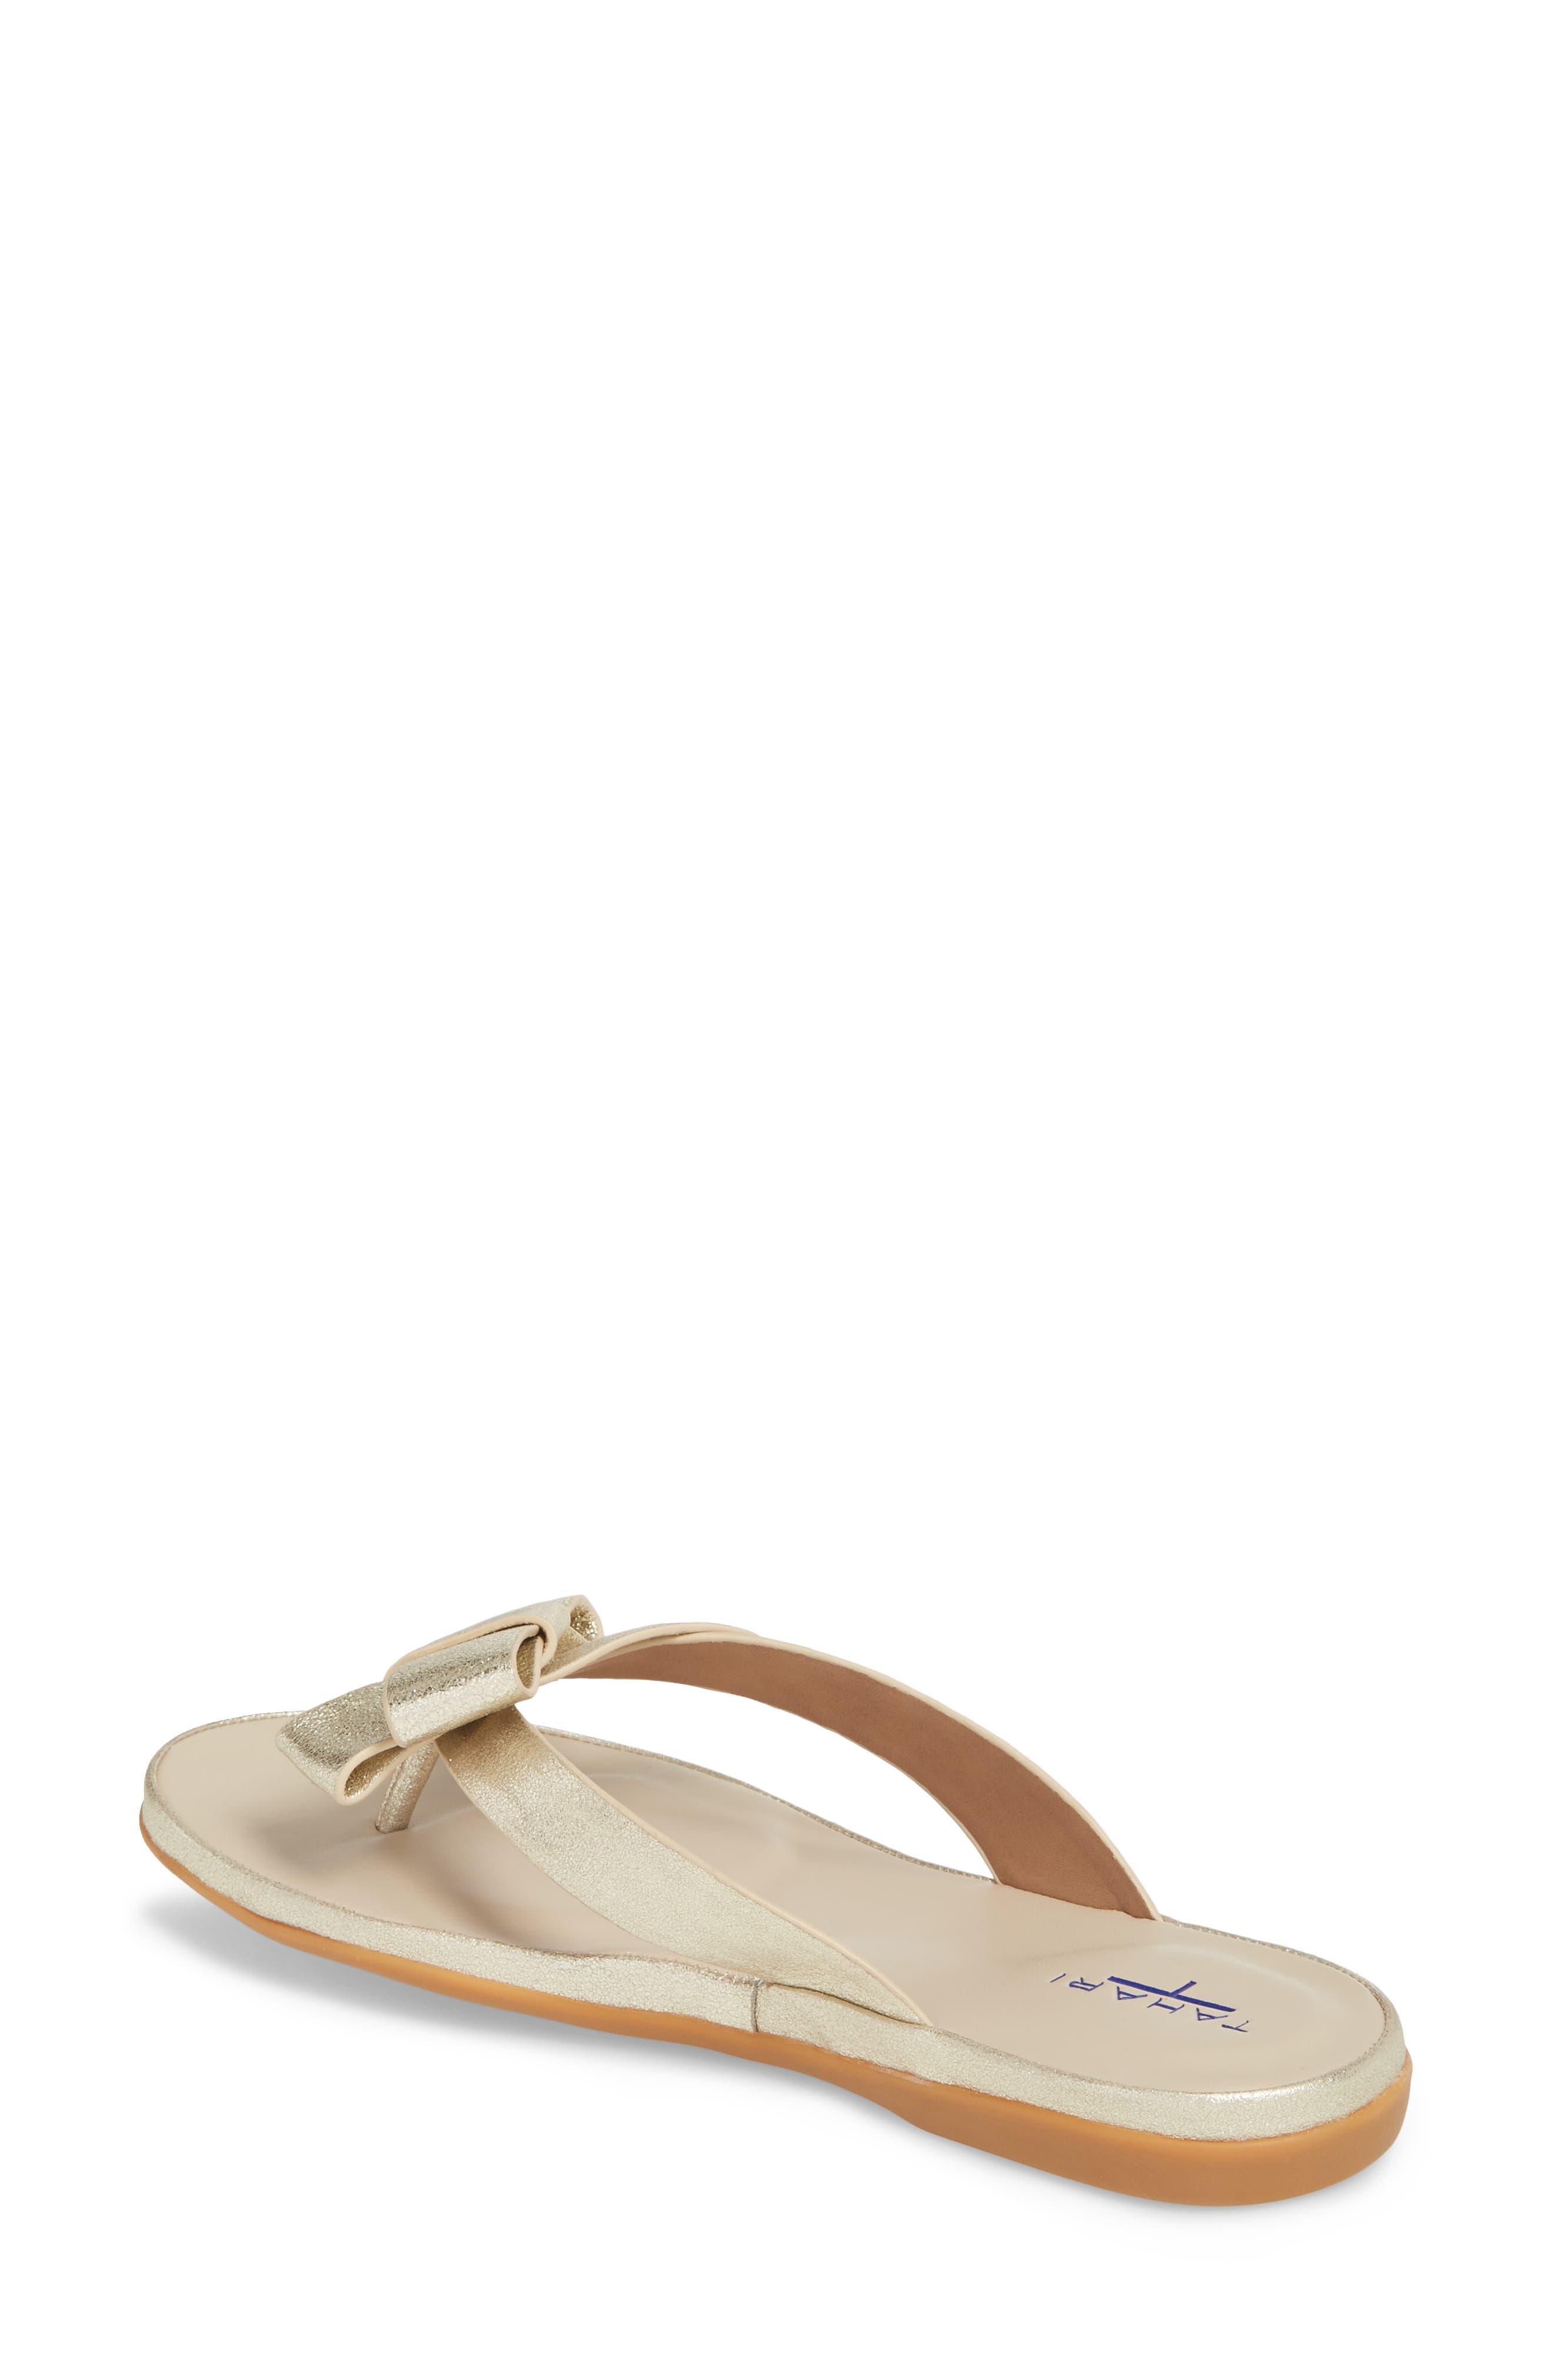 Aria Flip Flop,                             Alternate thumbnail 2, color,                             Warm Gold Leather